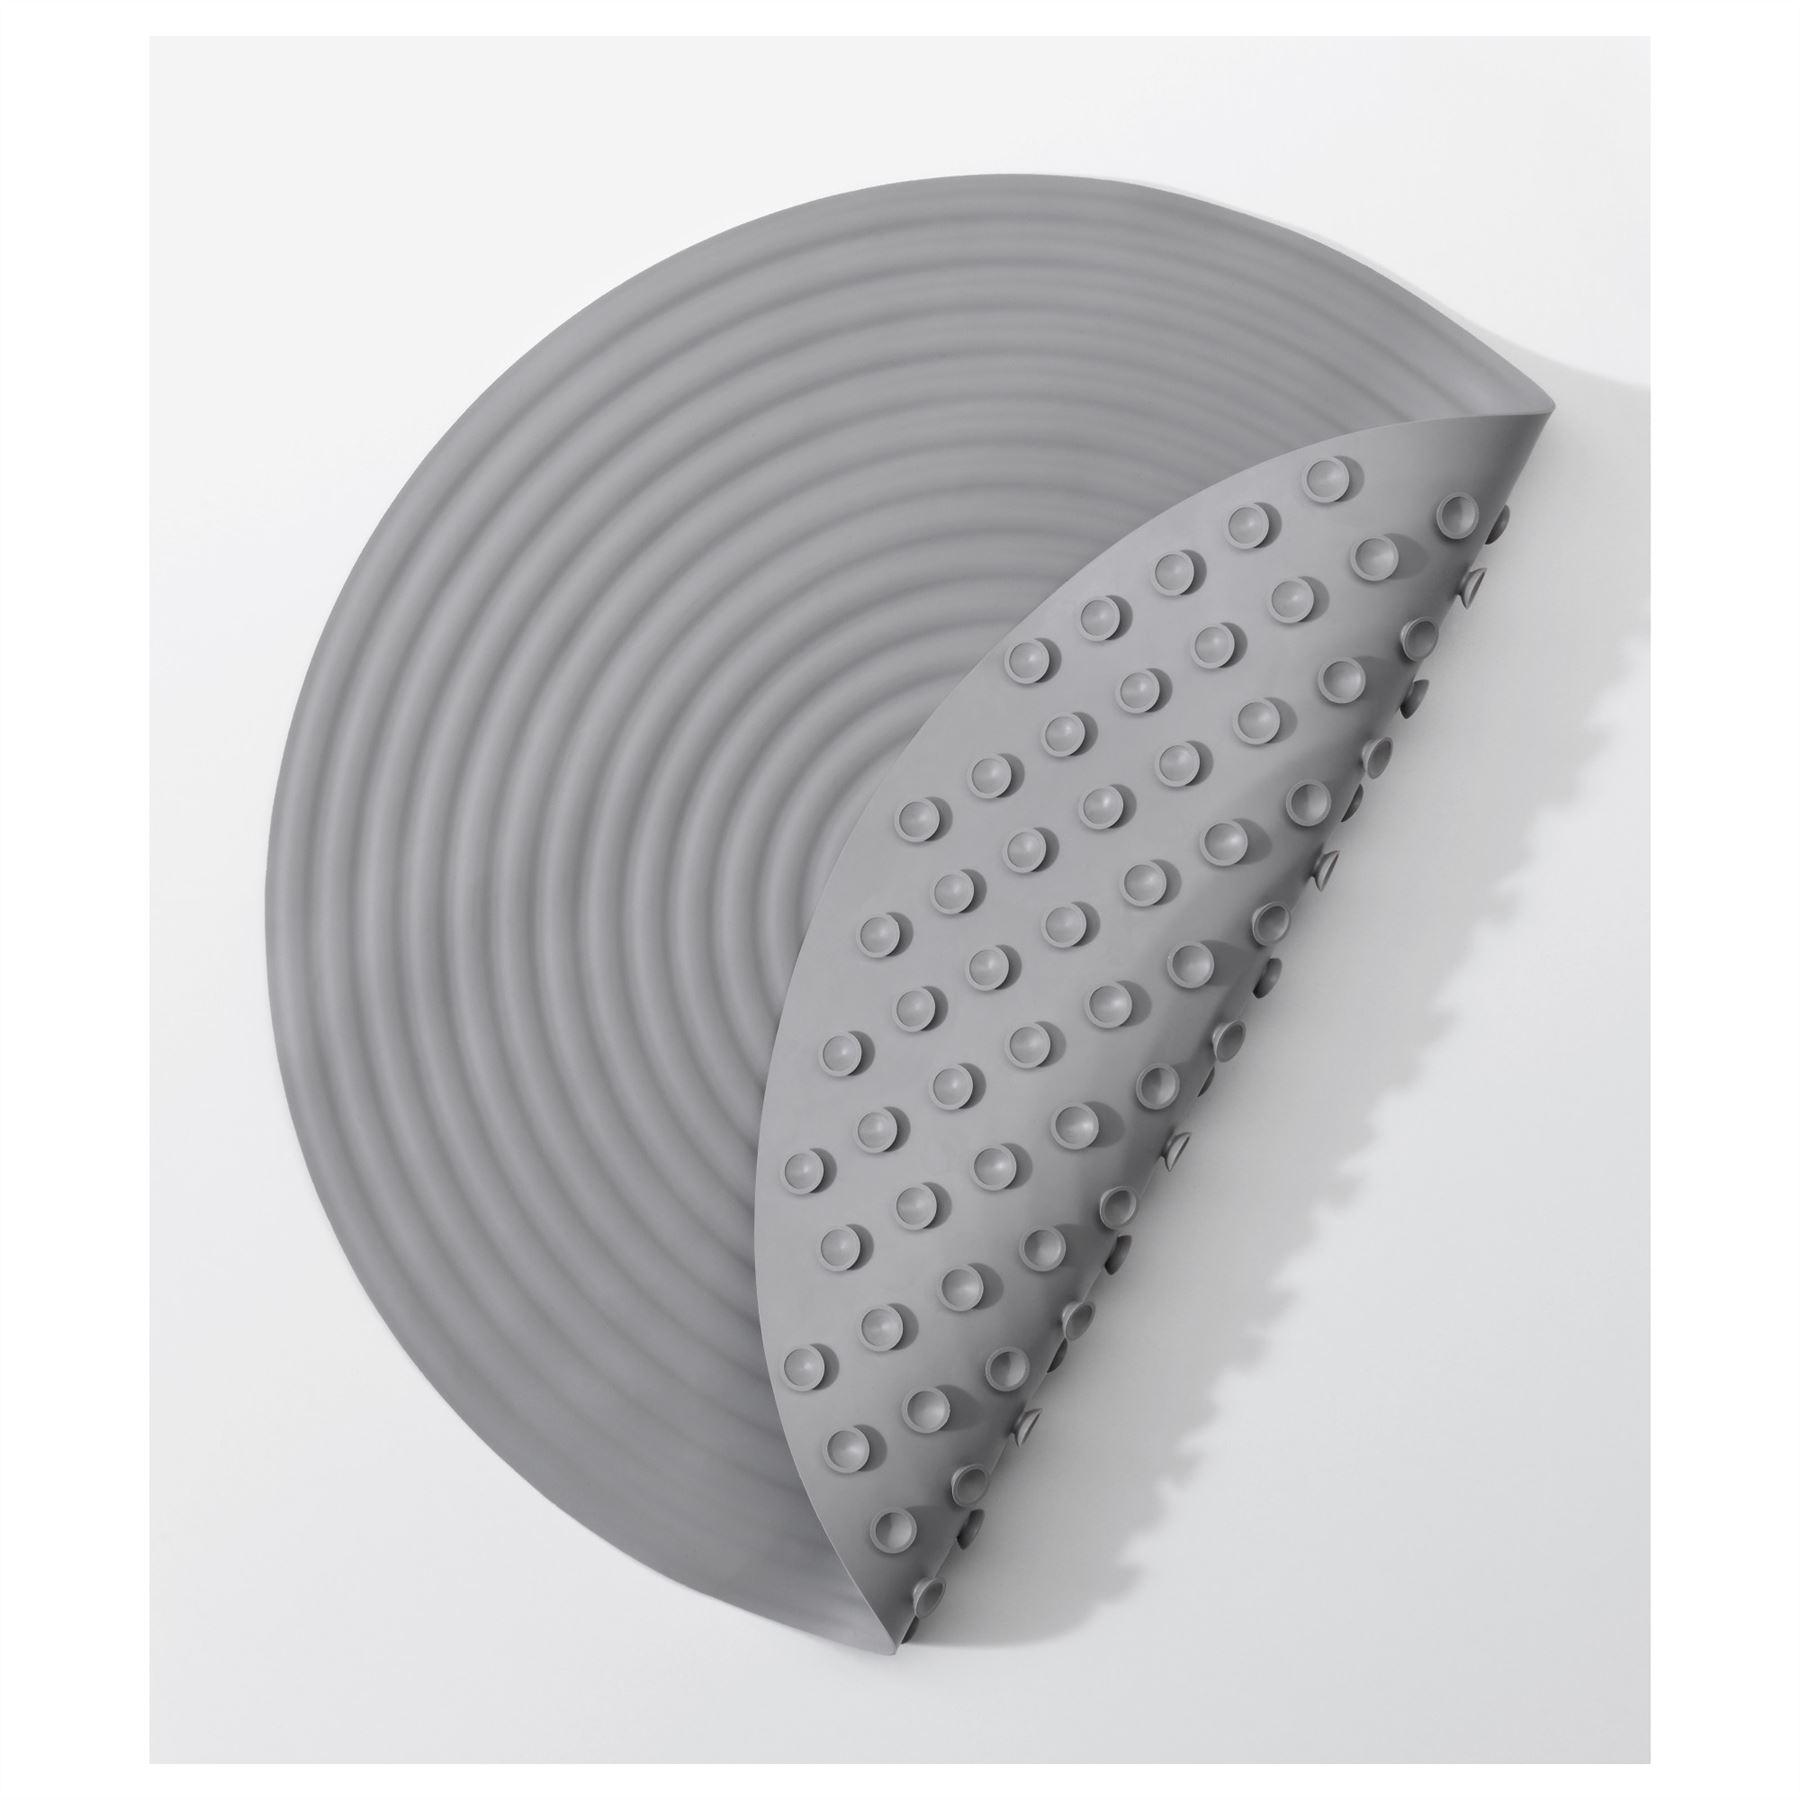 Ikea Doppa Shower Mat Bath Non Slip Round Grey Rubber | eBay